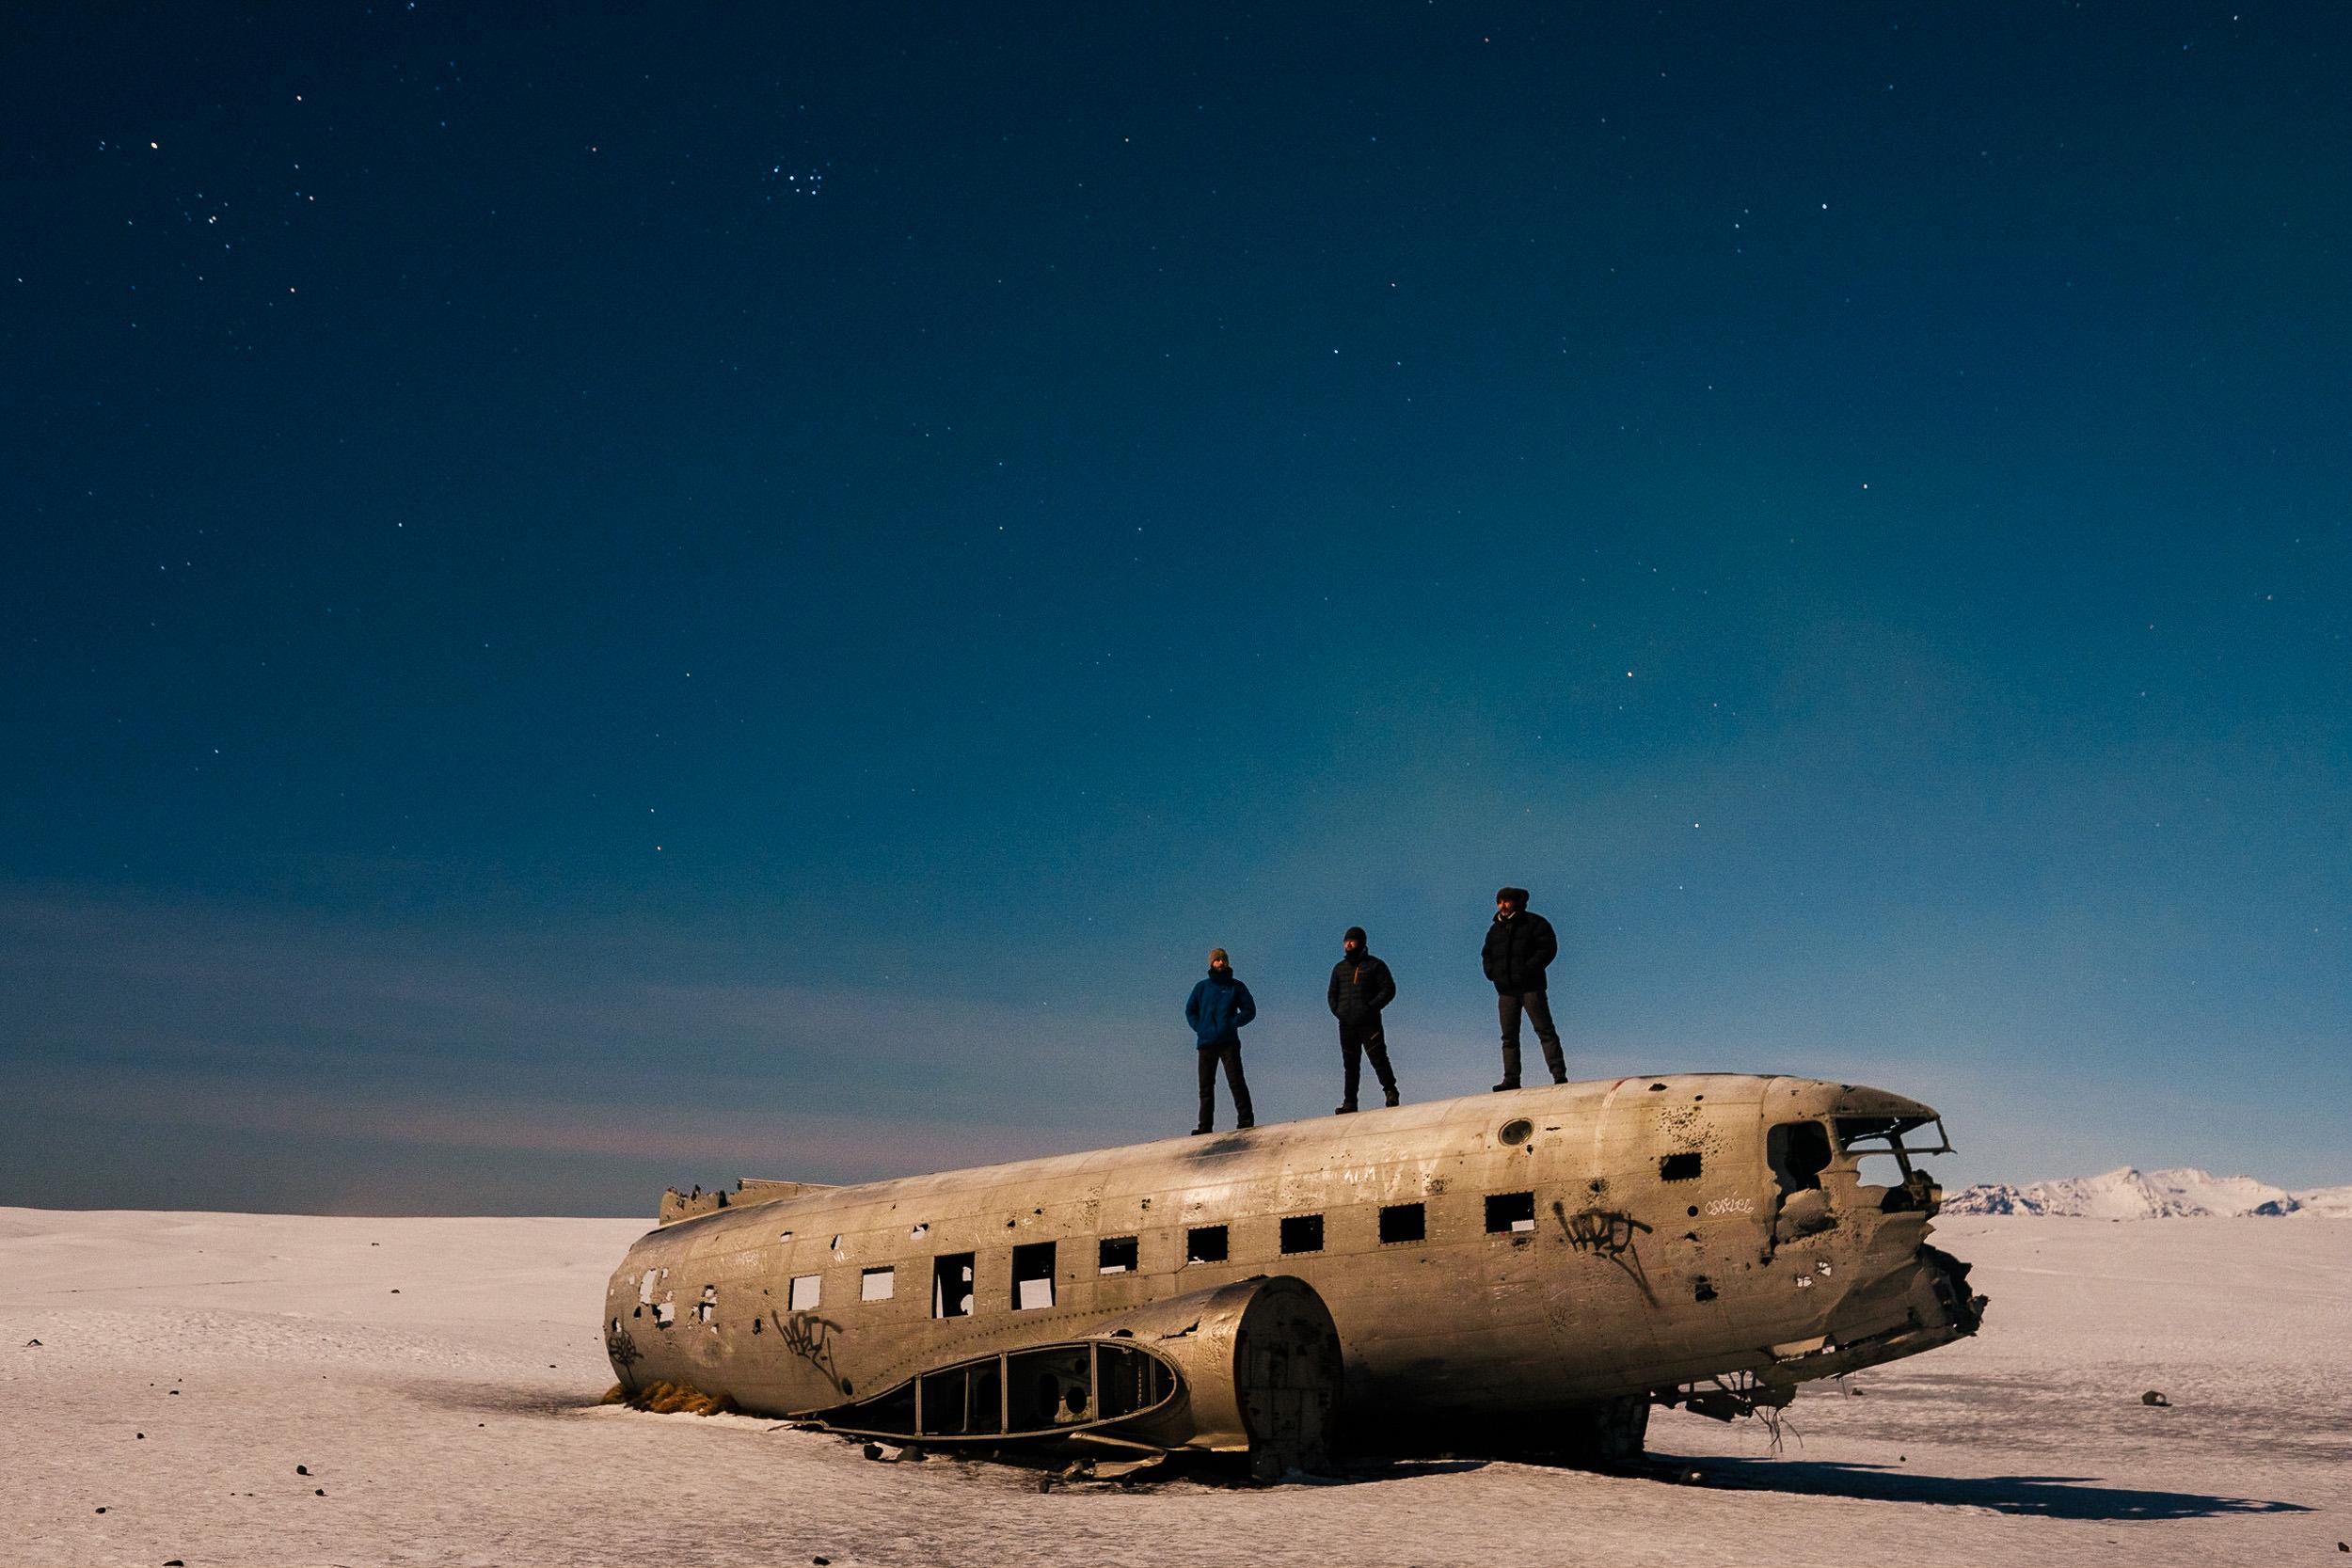 Collective_Wander_Iceland_Photographers_Trip_044.jpg